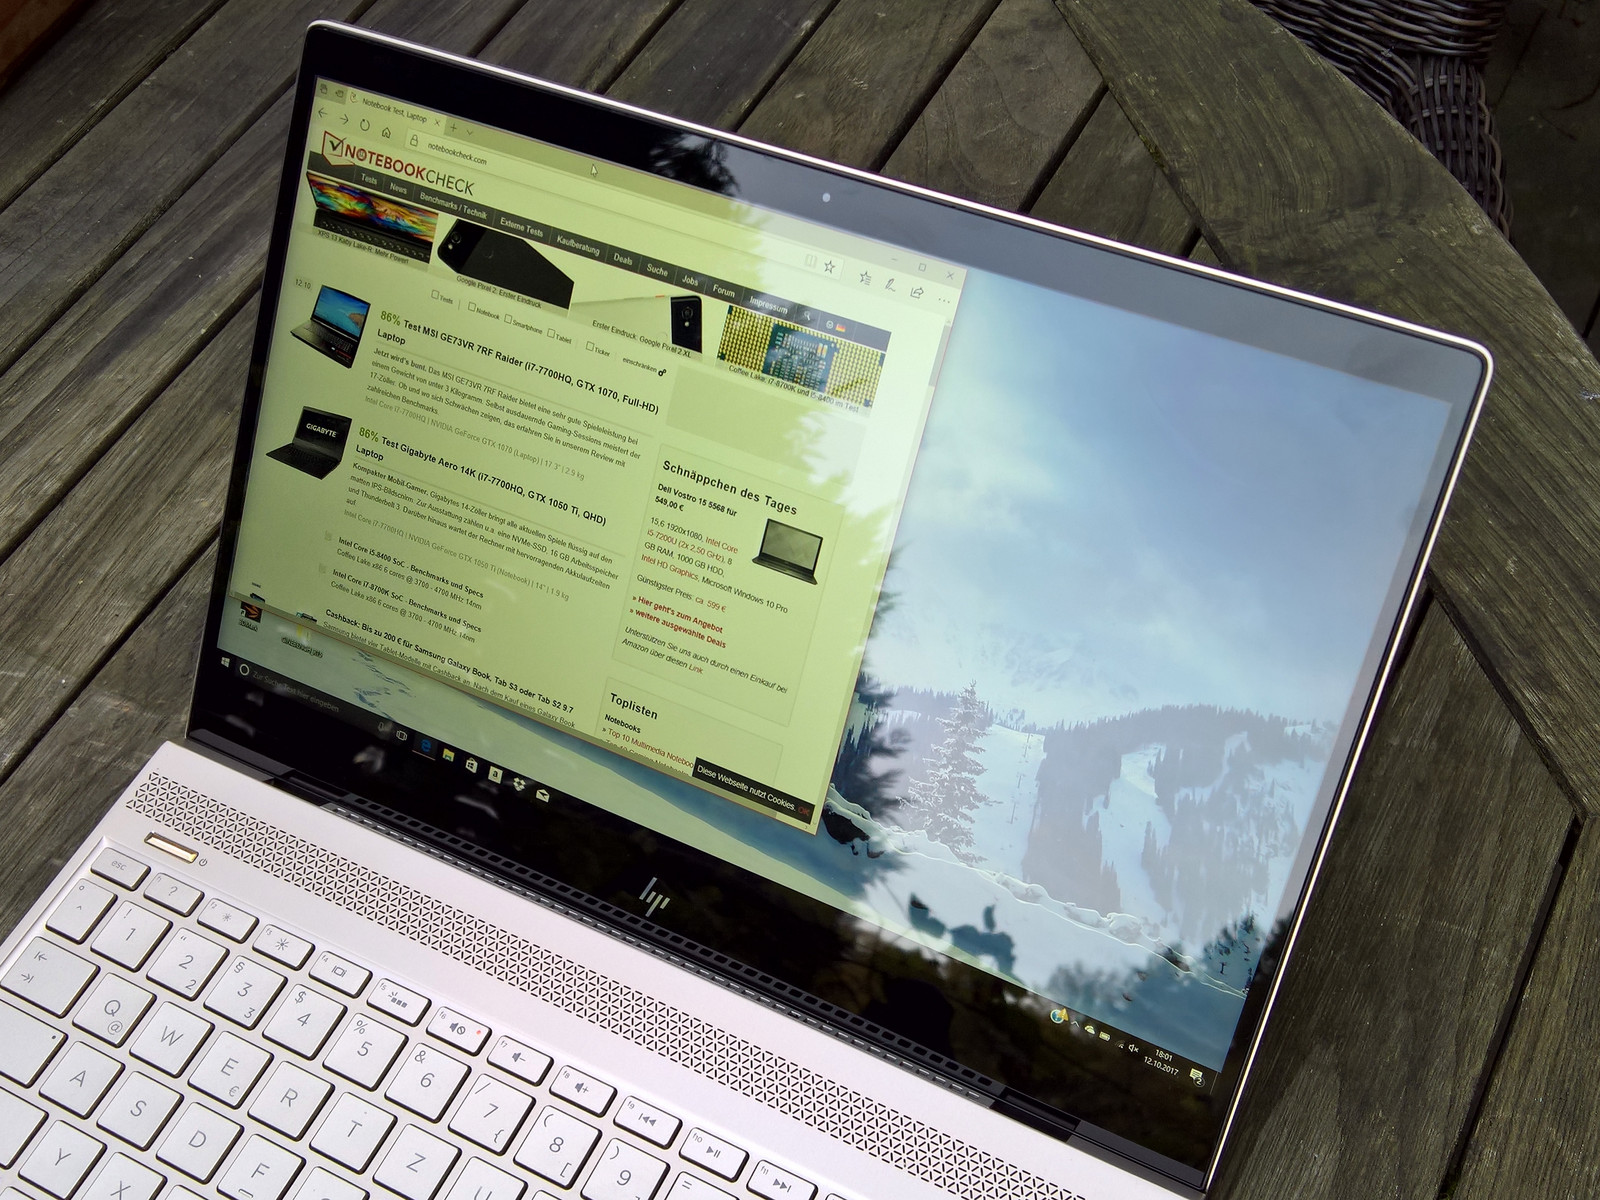 Harga Dan Spek Lenovo Yoga 720 13ikb Notebook Silver I5 7200u 8gb Hp 14 Am016tu Inch4gb500gbwin 10 Envy 13 Ad006ng I7 7500u Mx150 Laptop Review Notebookcheck